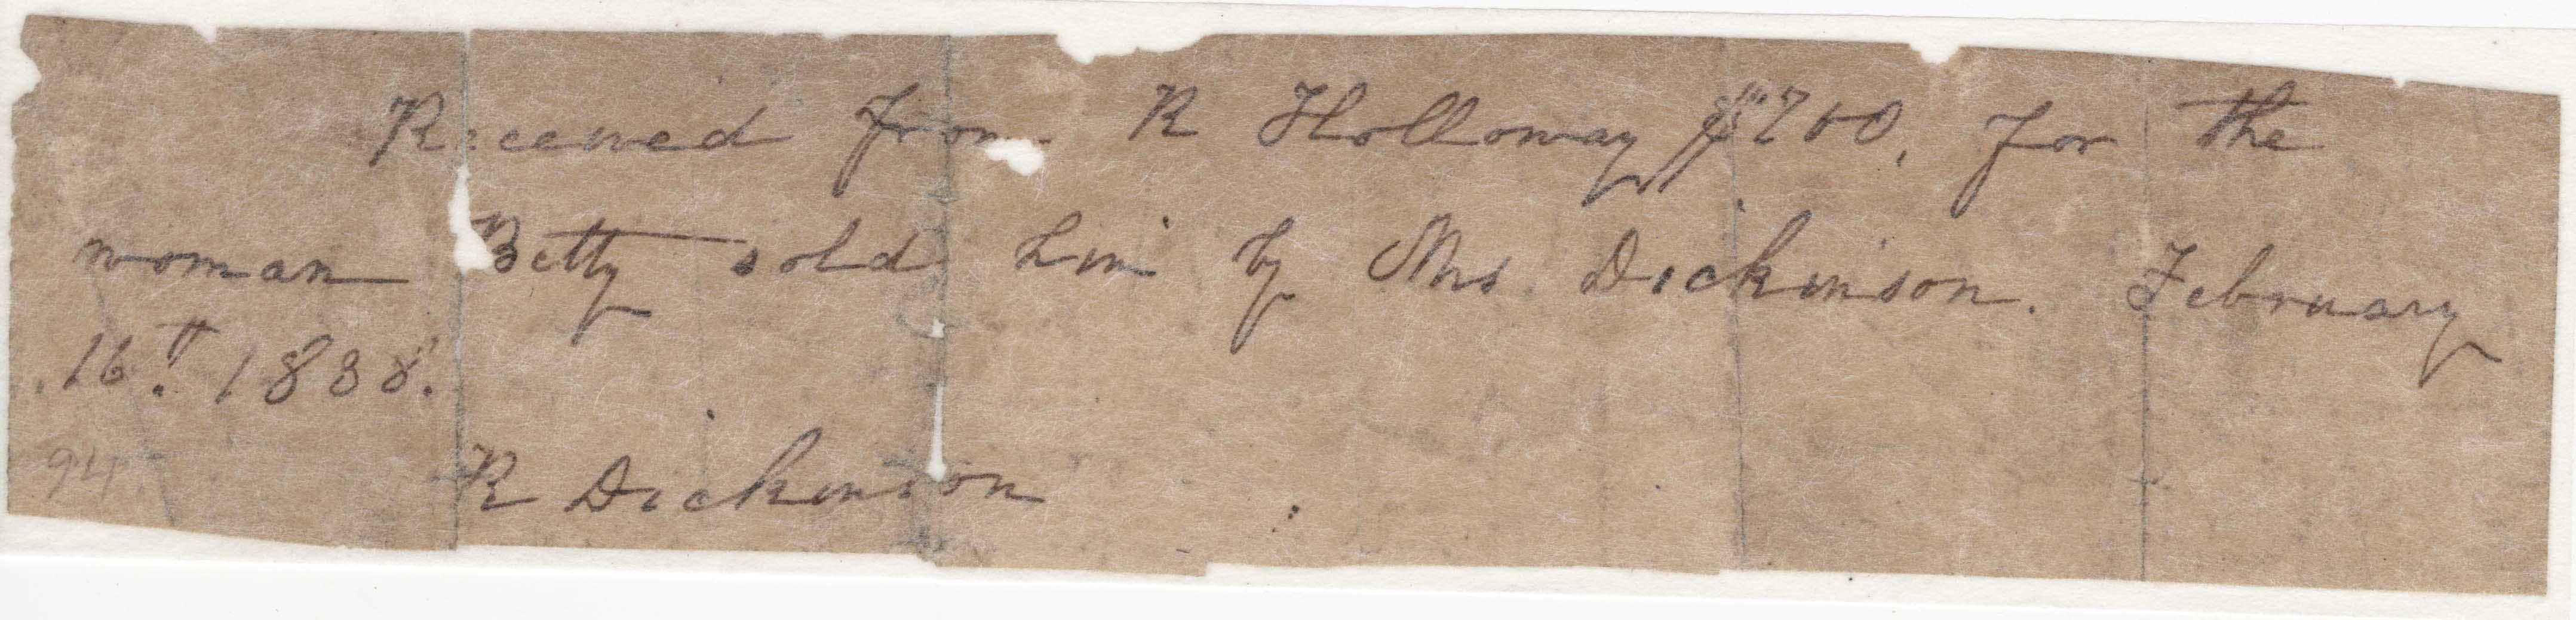 Receipt (1838) for slave